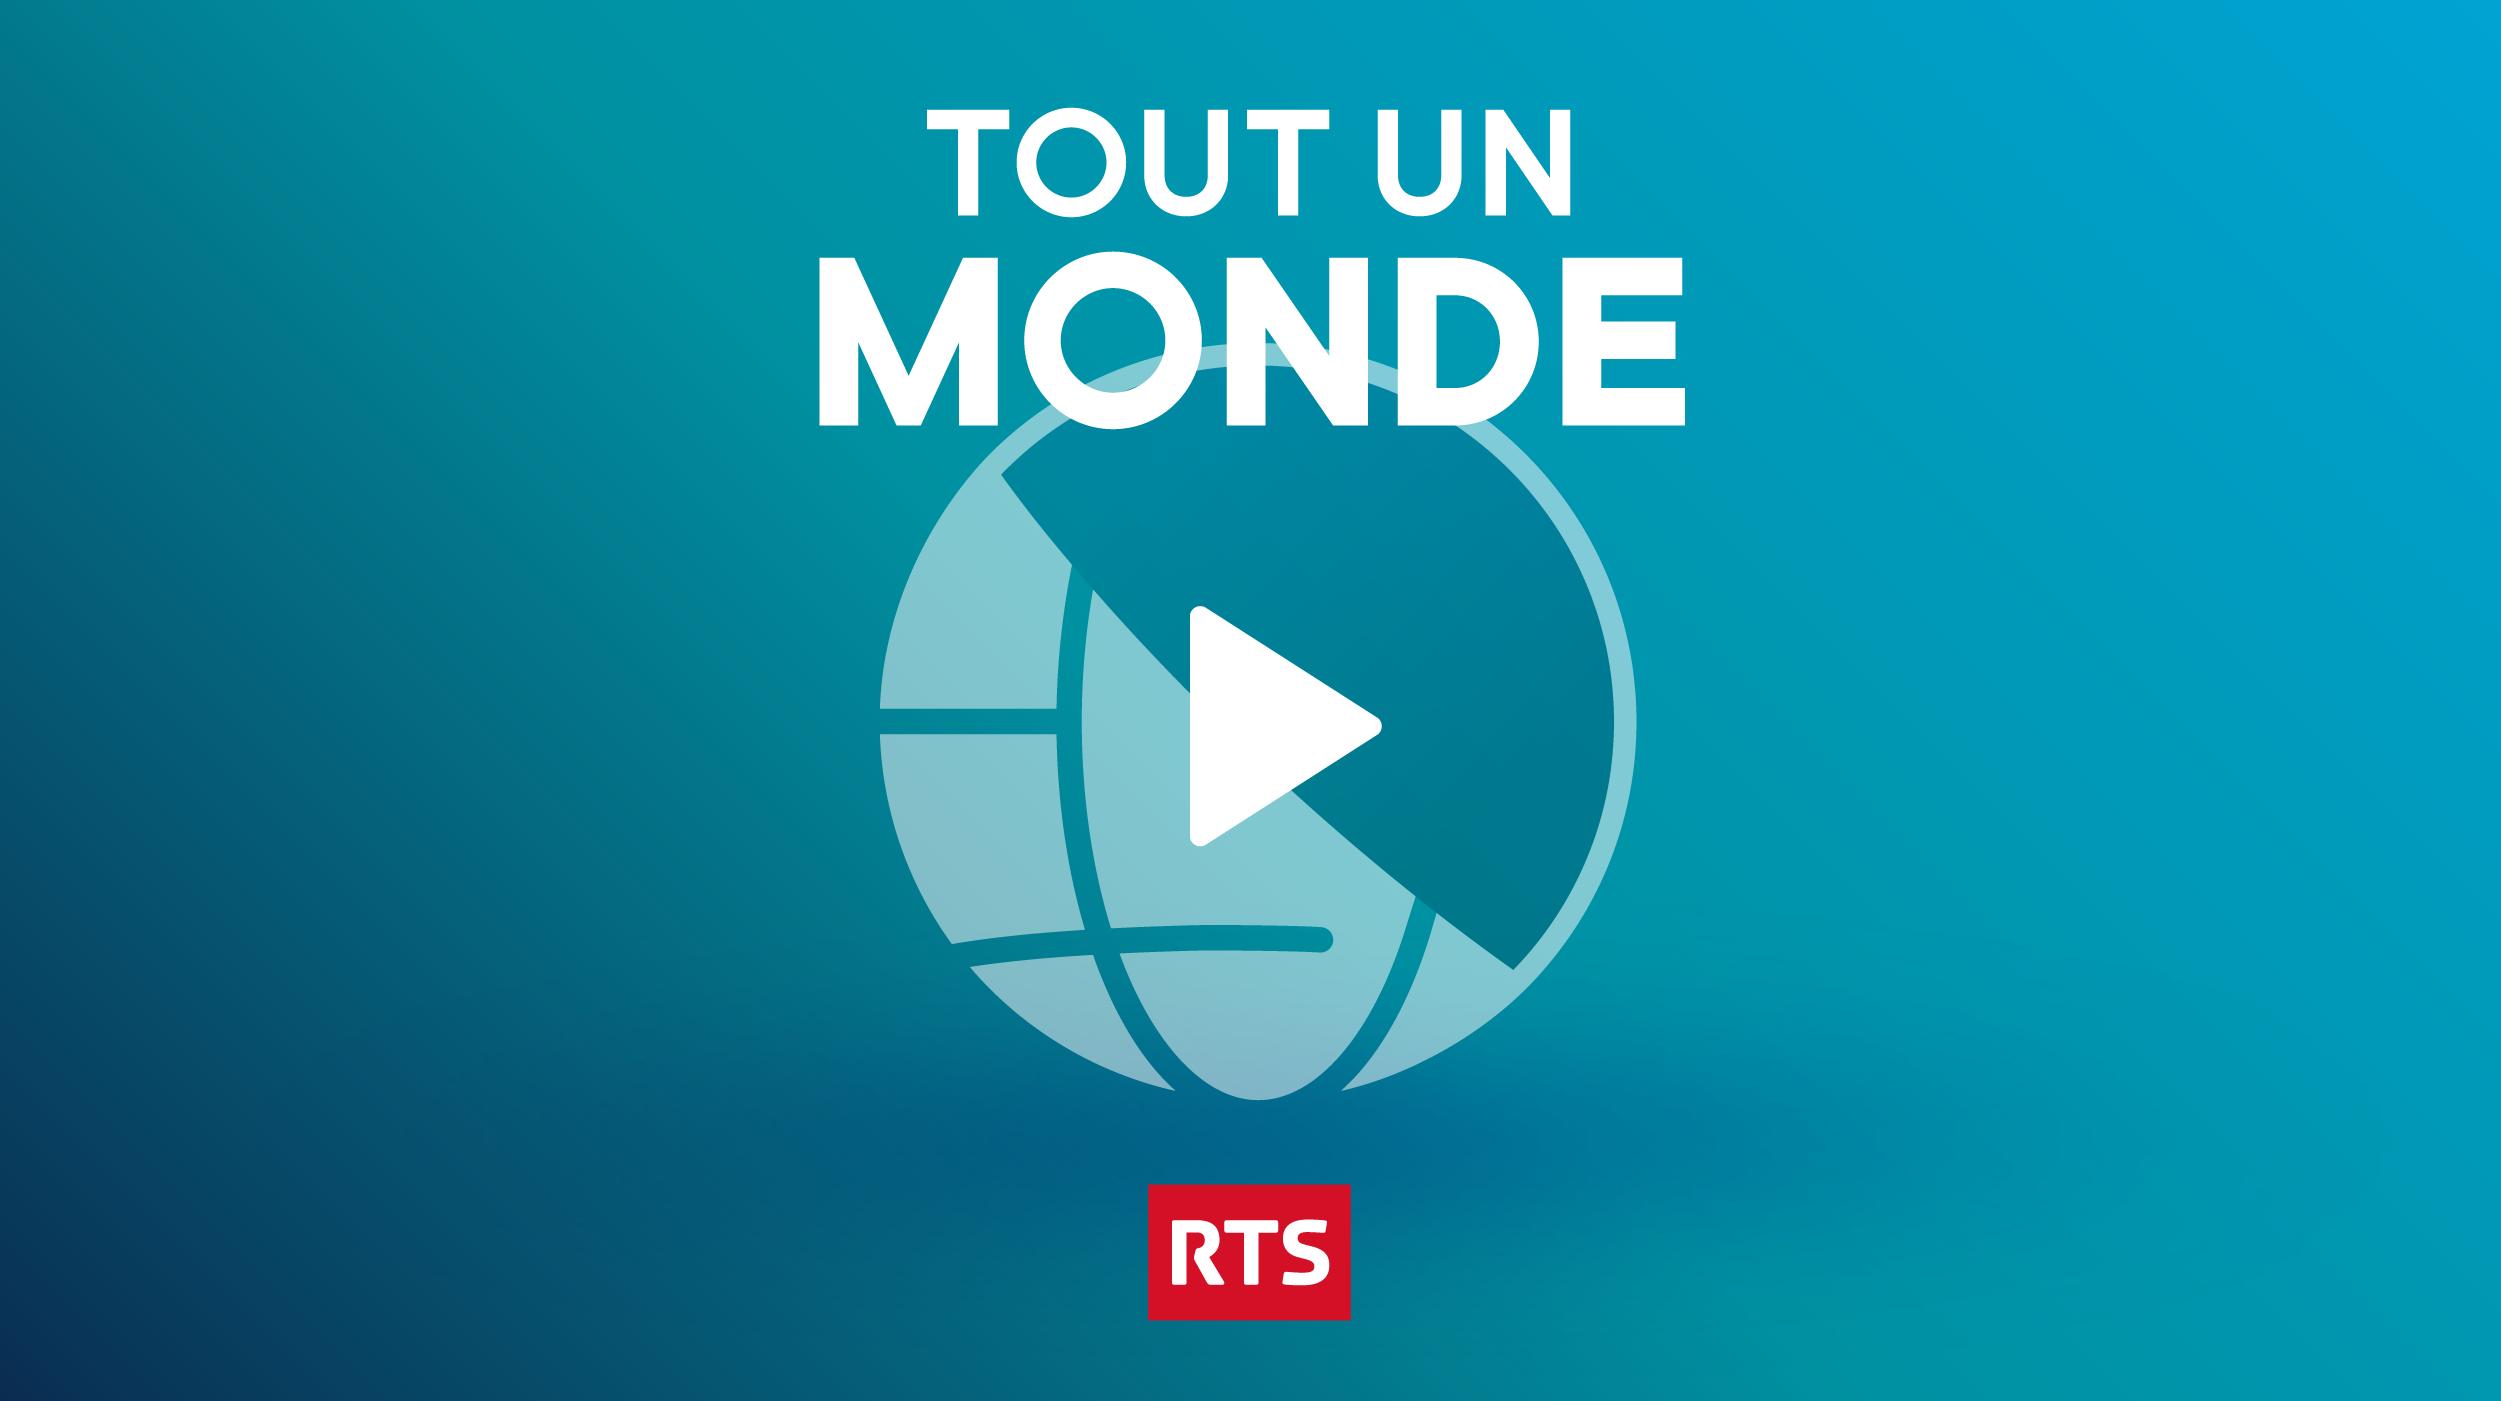 Logo Tout un monde 2019